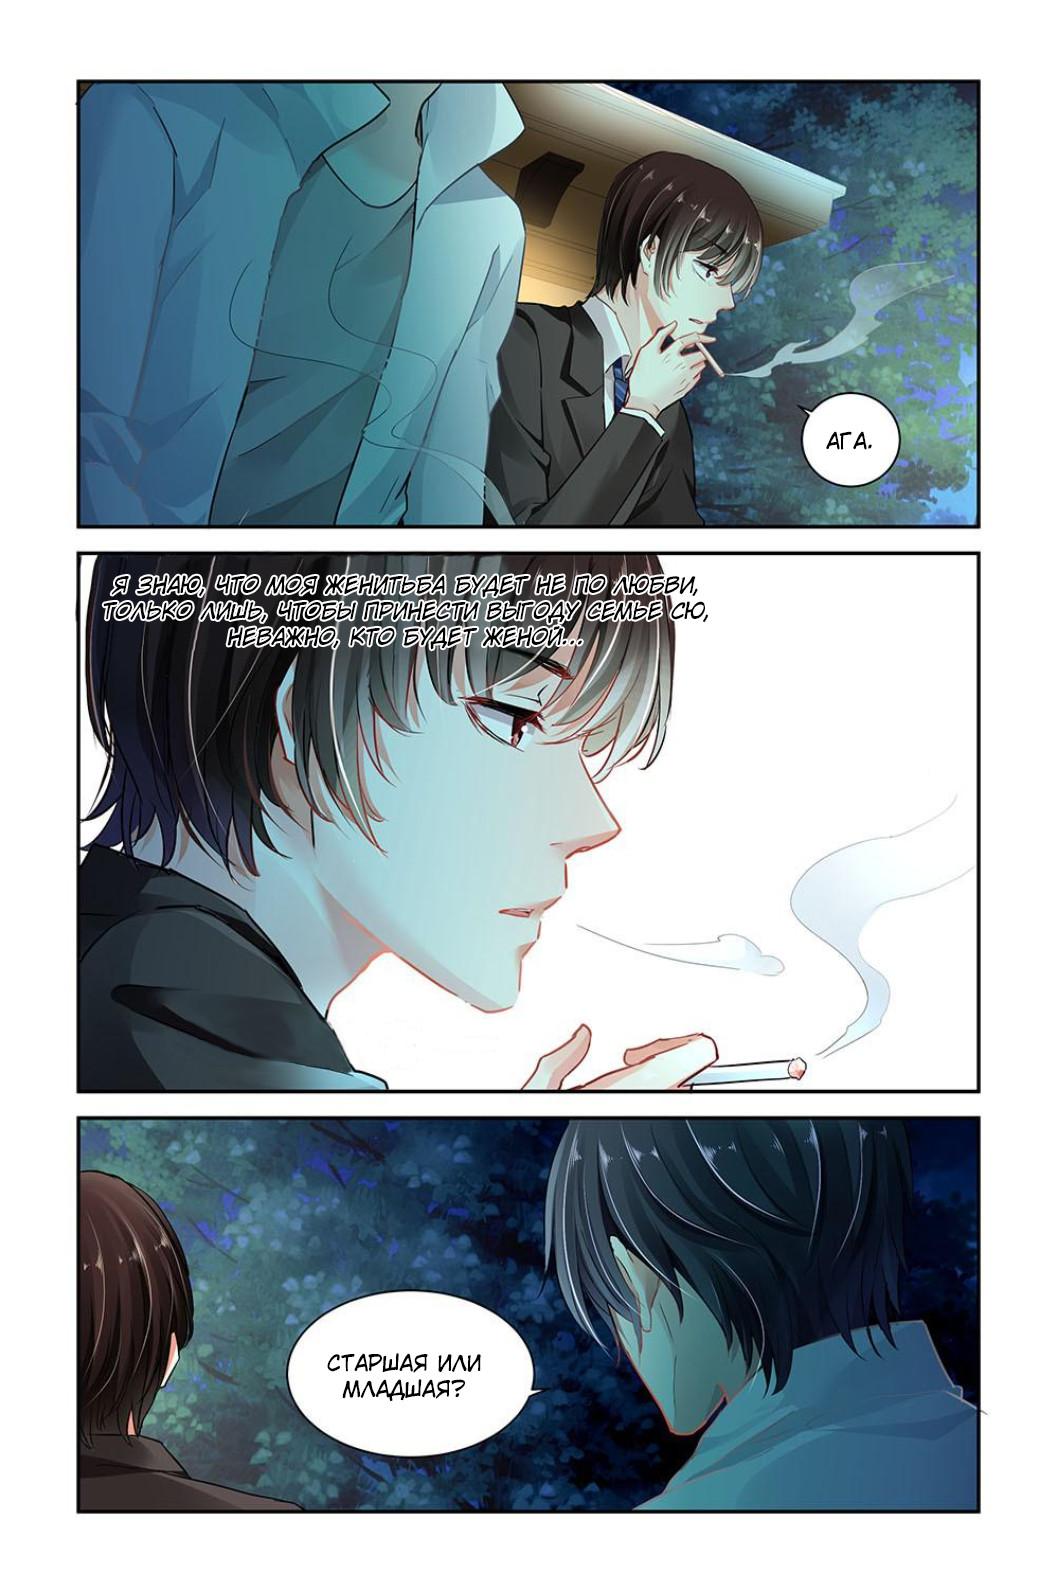 https://r1.ninemanga.com/comics/pic2/14/27598/284692/1455510336386.jpg Page 4